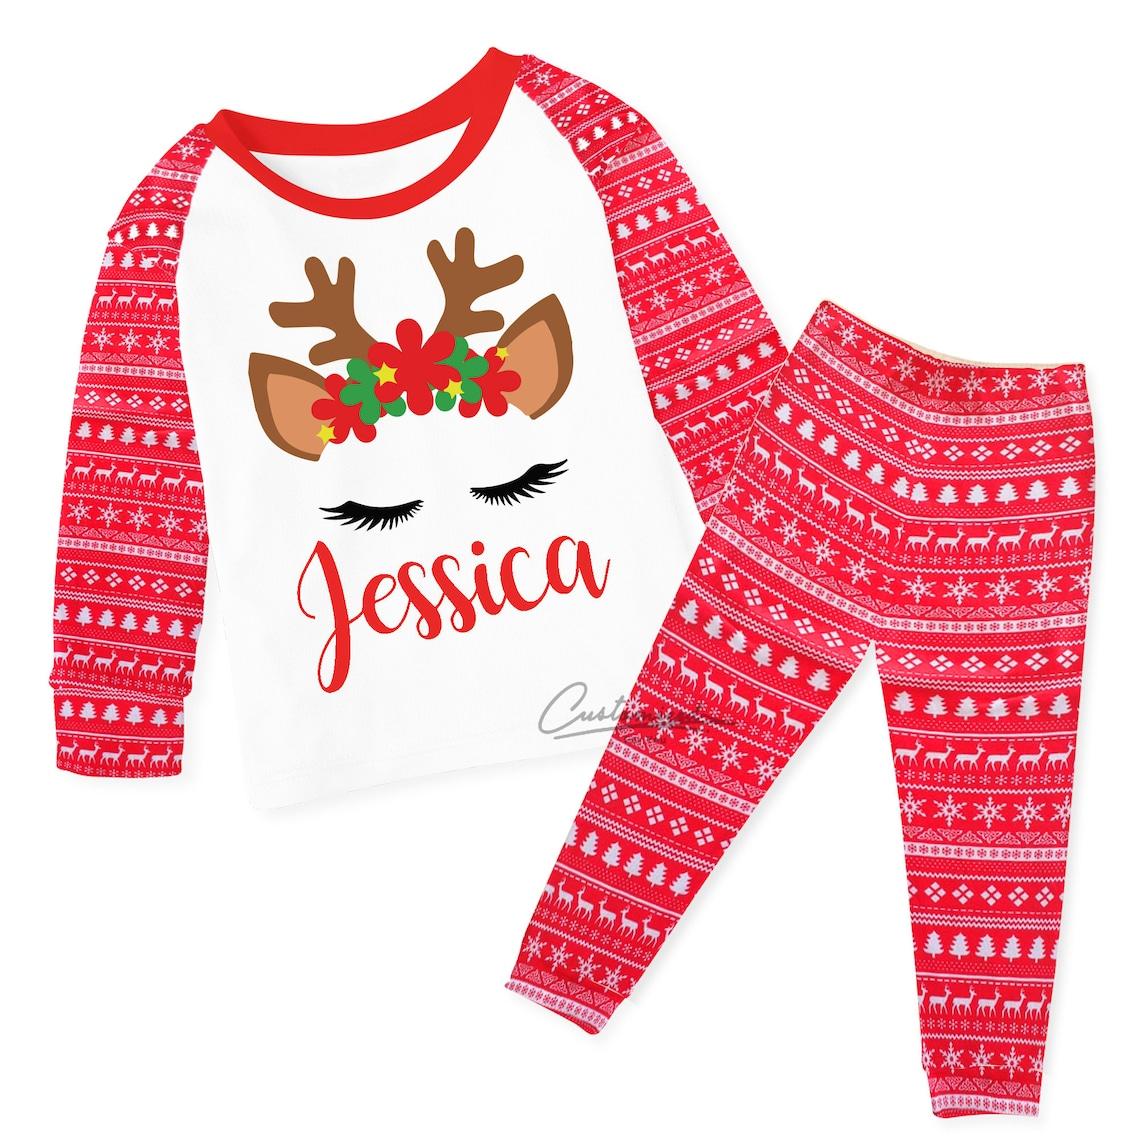 Personalised Reindeer Unicorn Christmas Pyjamas image 0